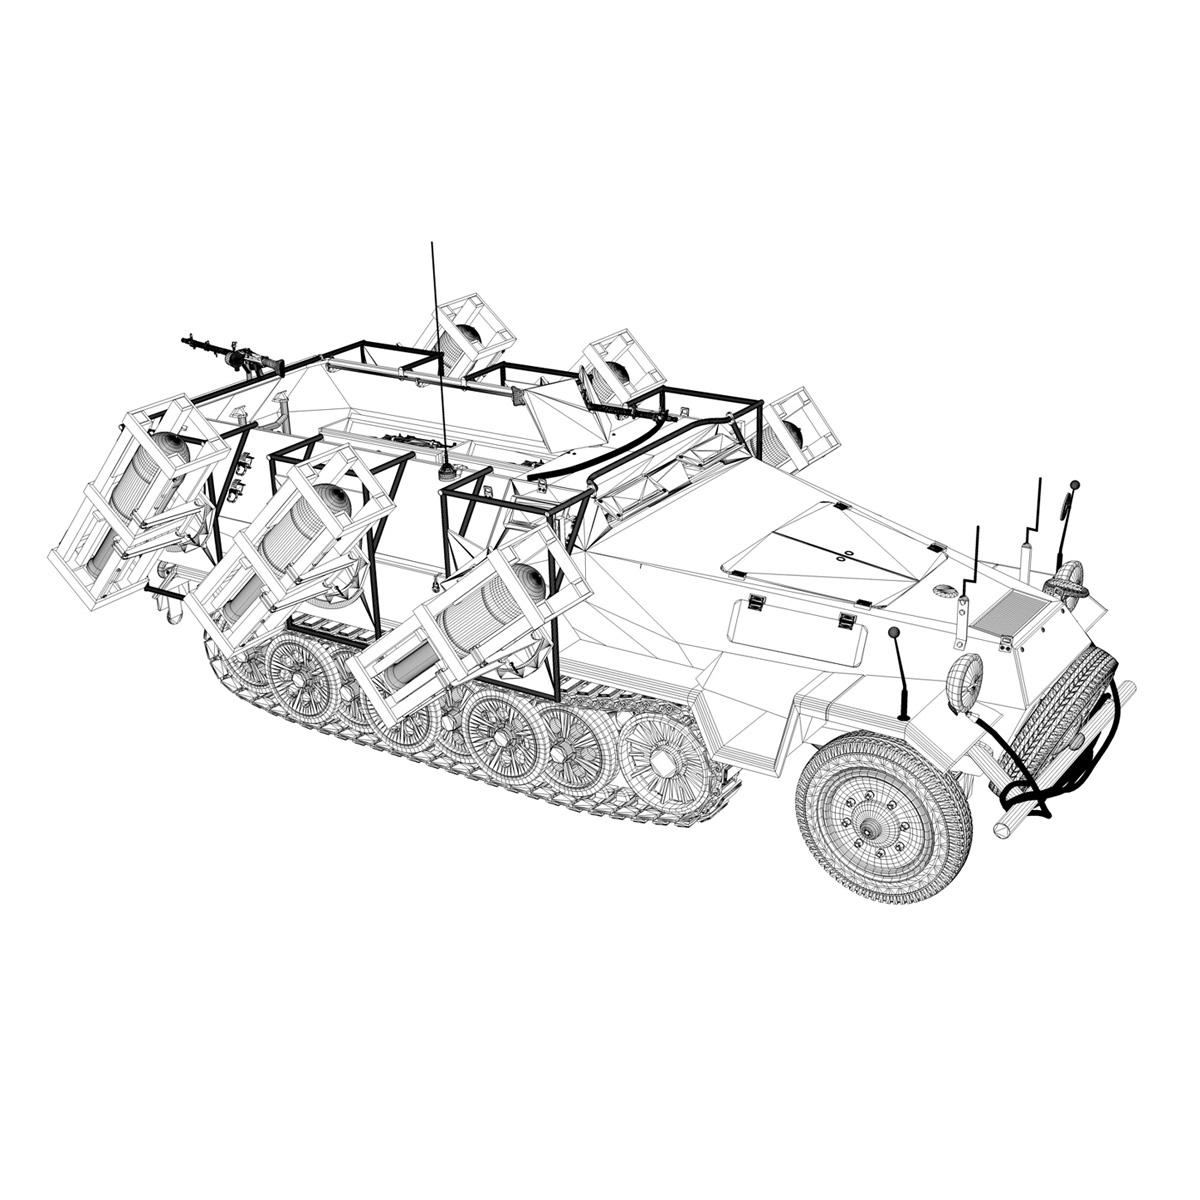 sdkfz 251 ausf.b – ground stuka 3d model 3ds fbx c4d lwo obj 251689